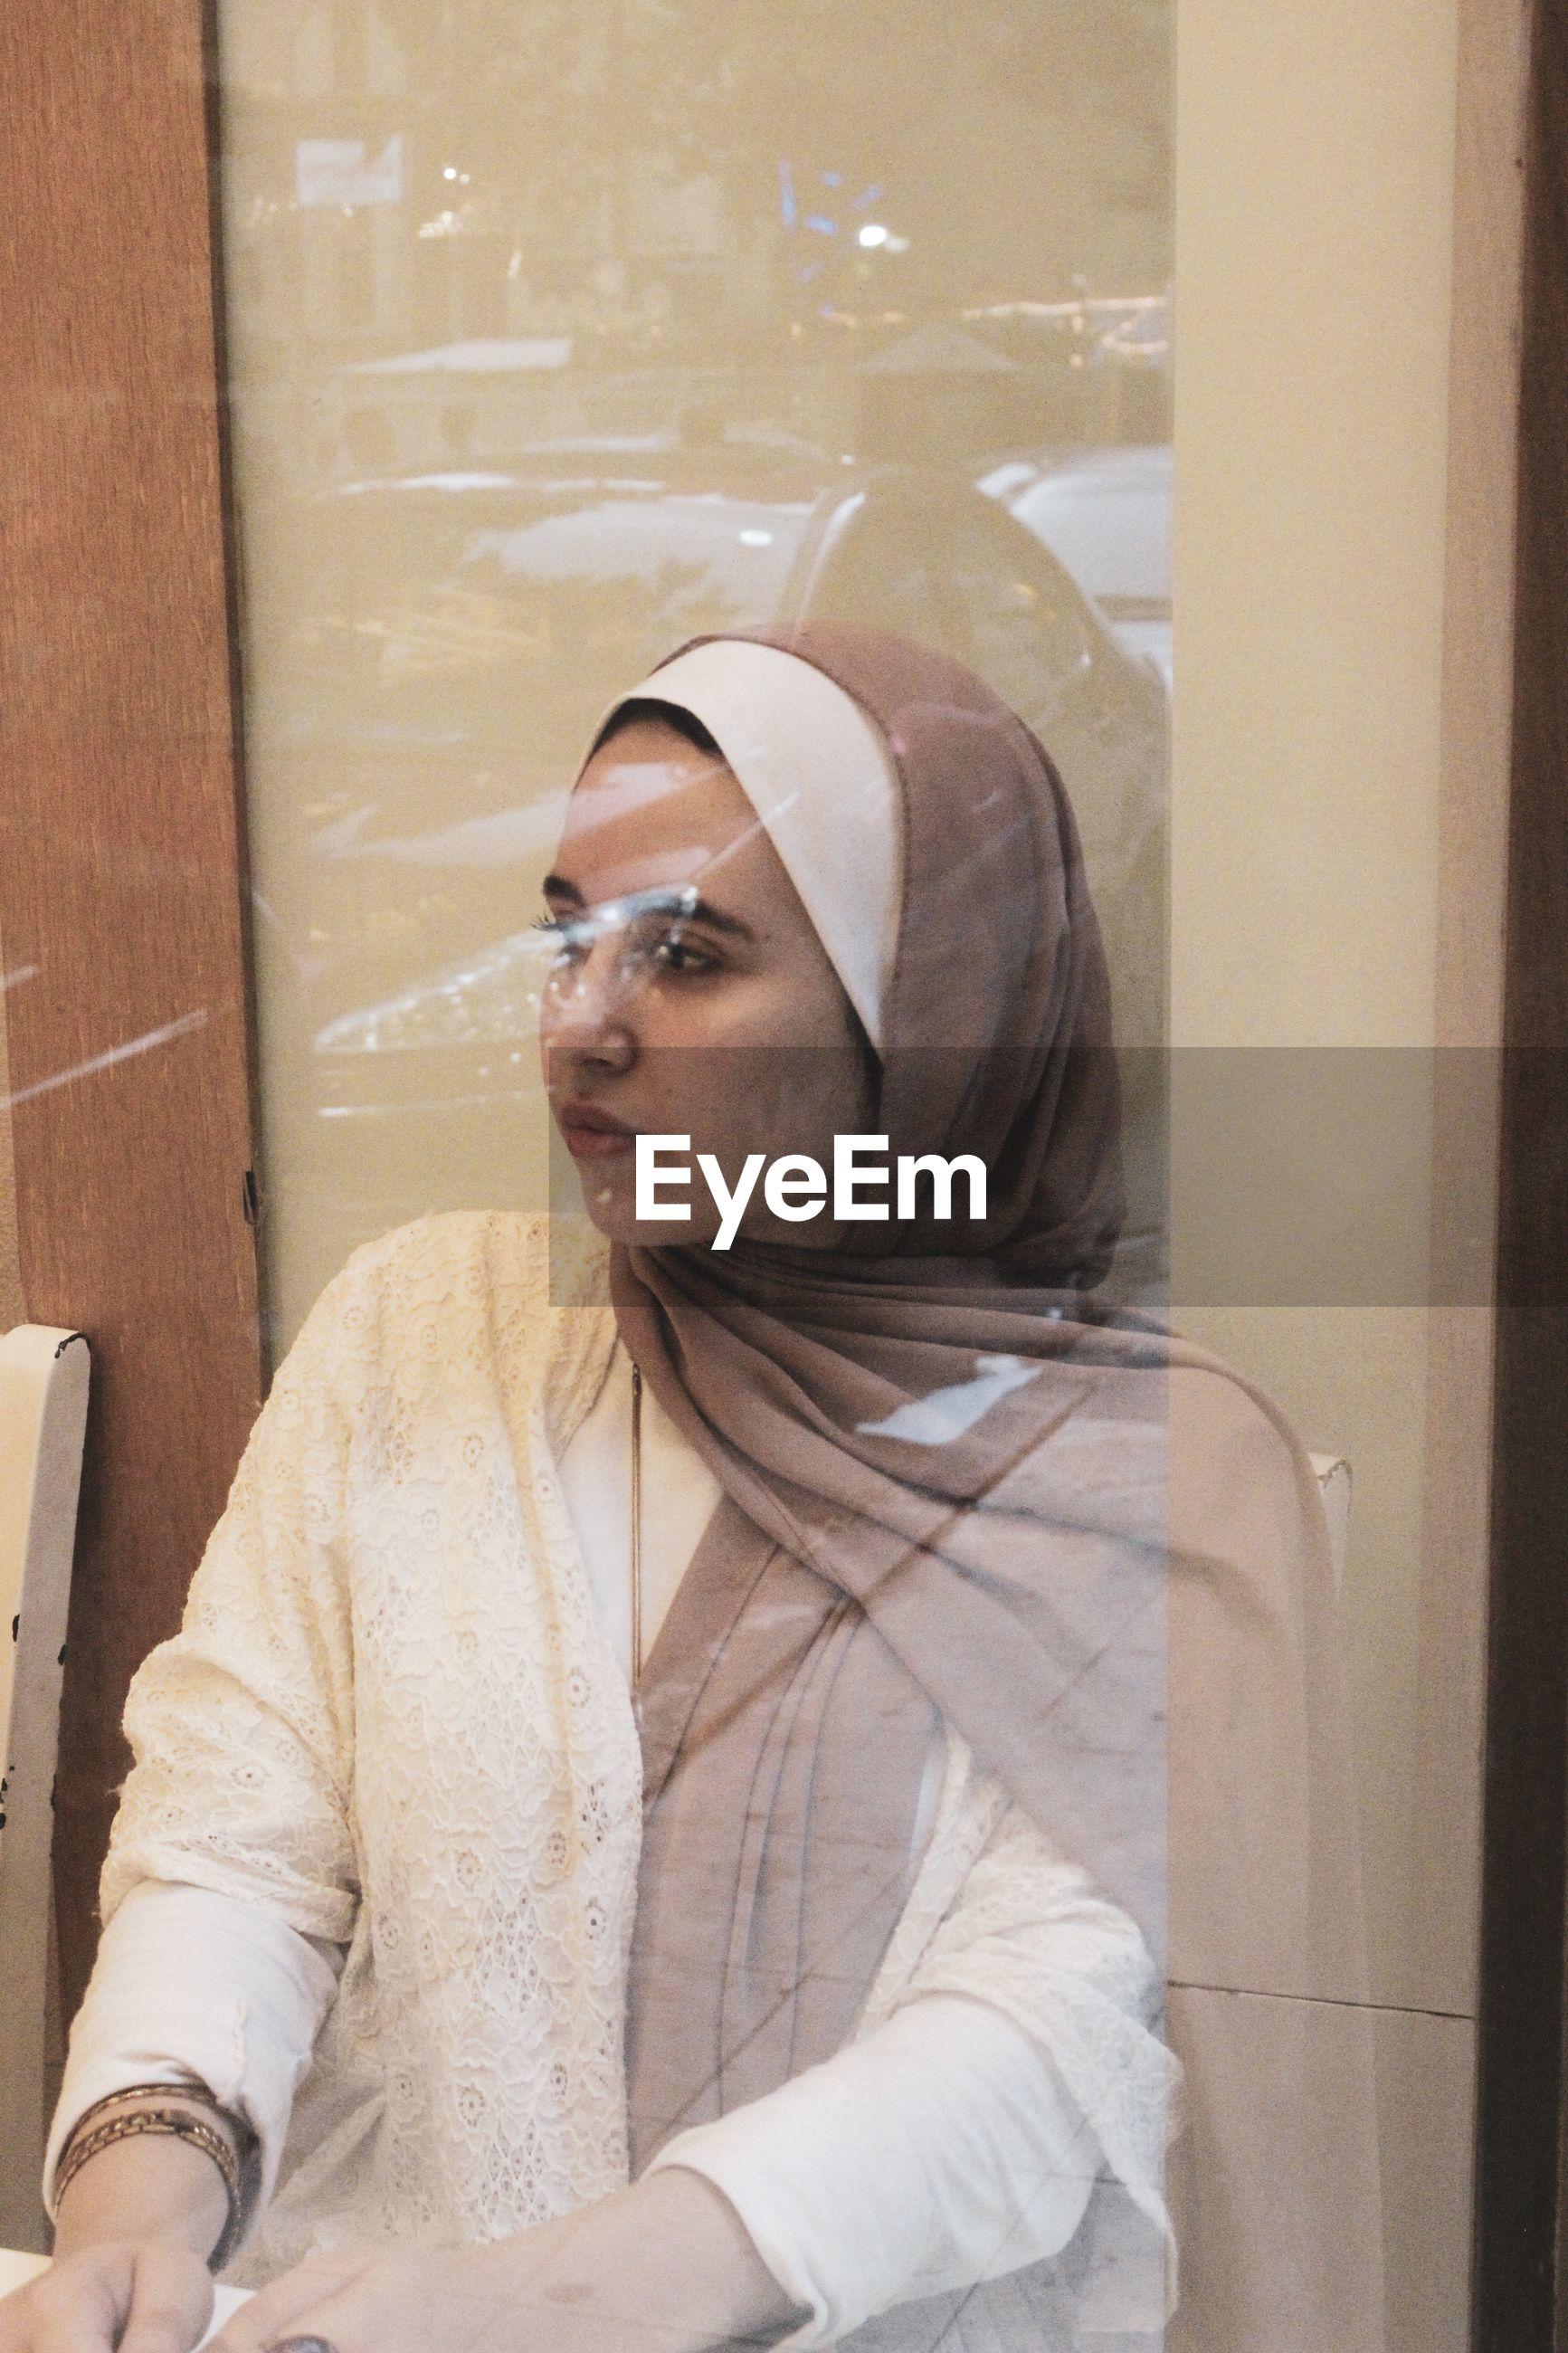 Woman in headscarf seen through glass window